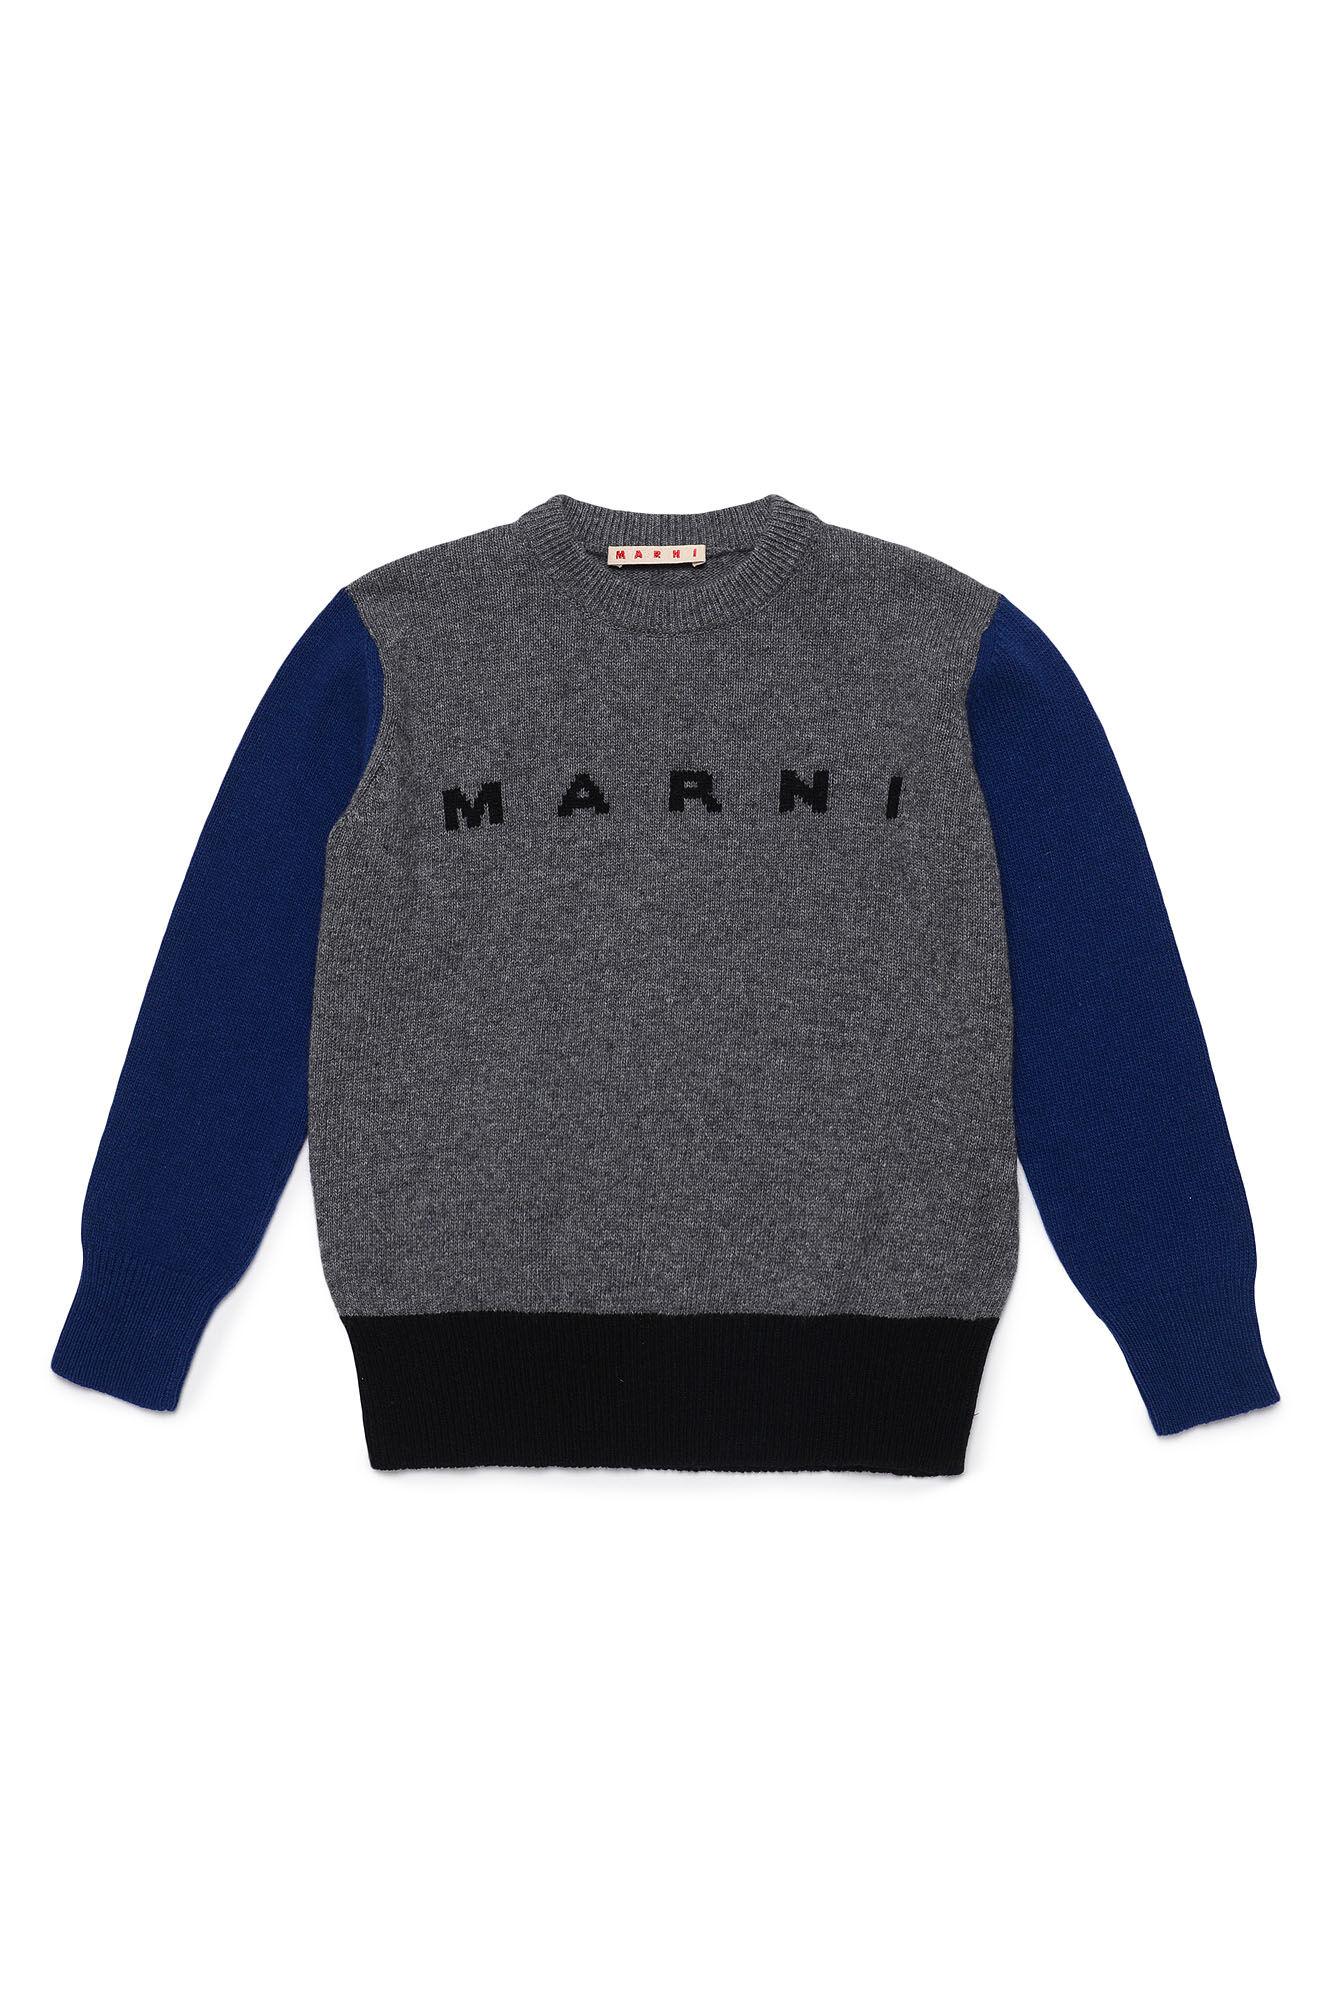 Mesh - Marni Junior